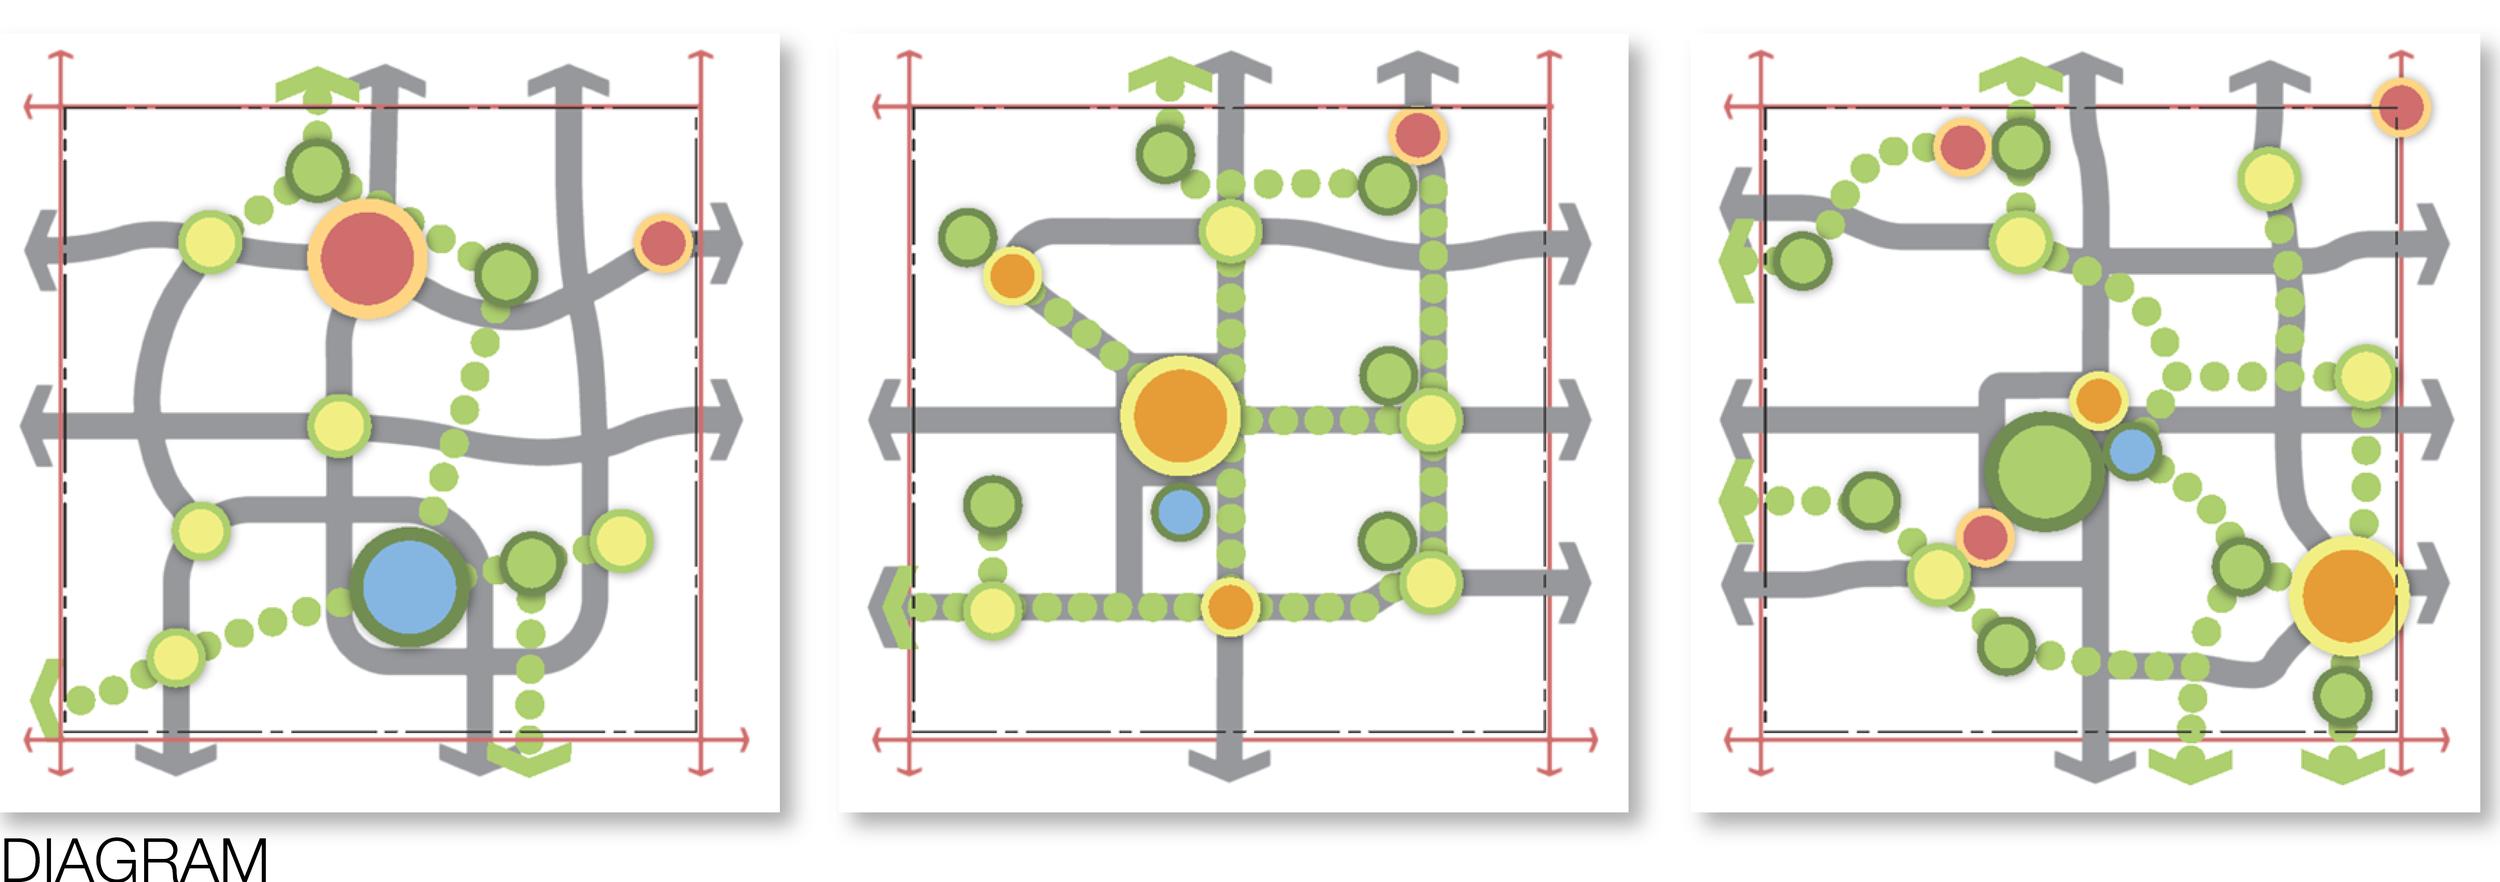 edgm_diagram.jpg